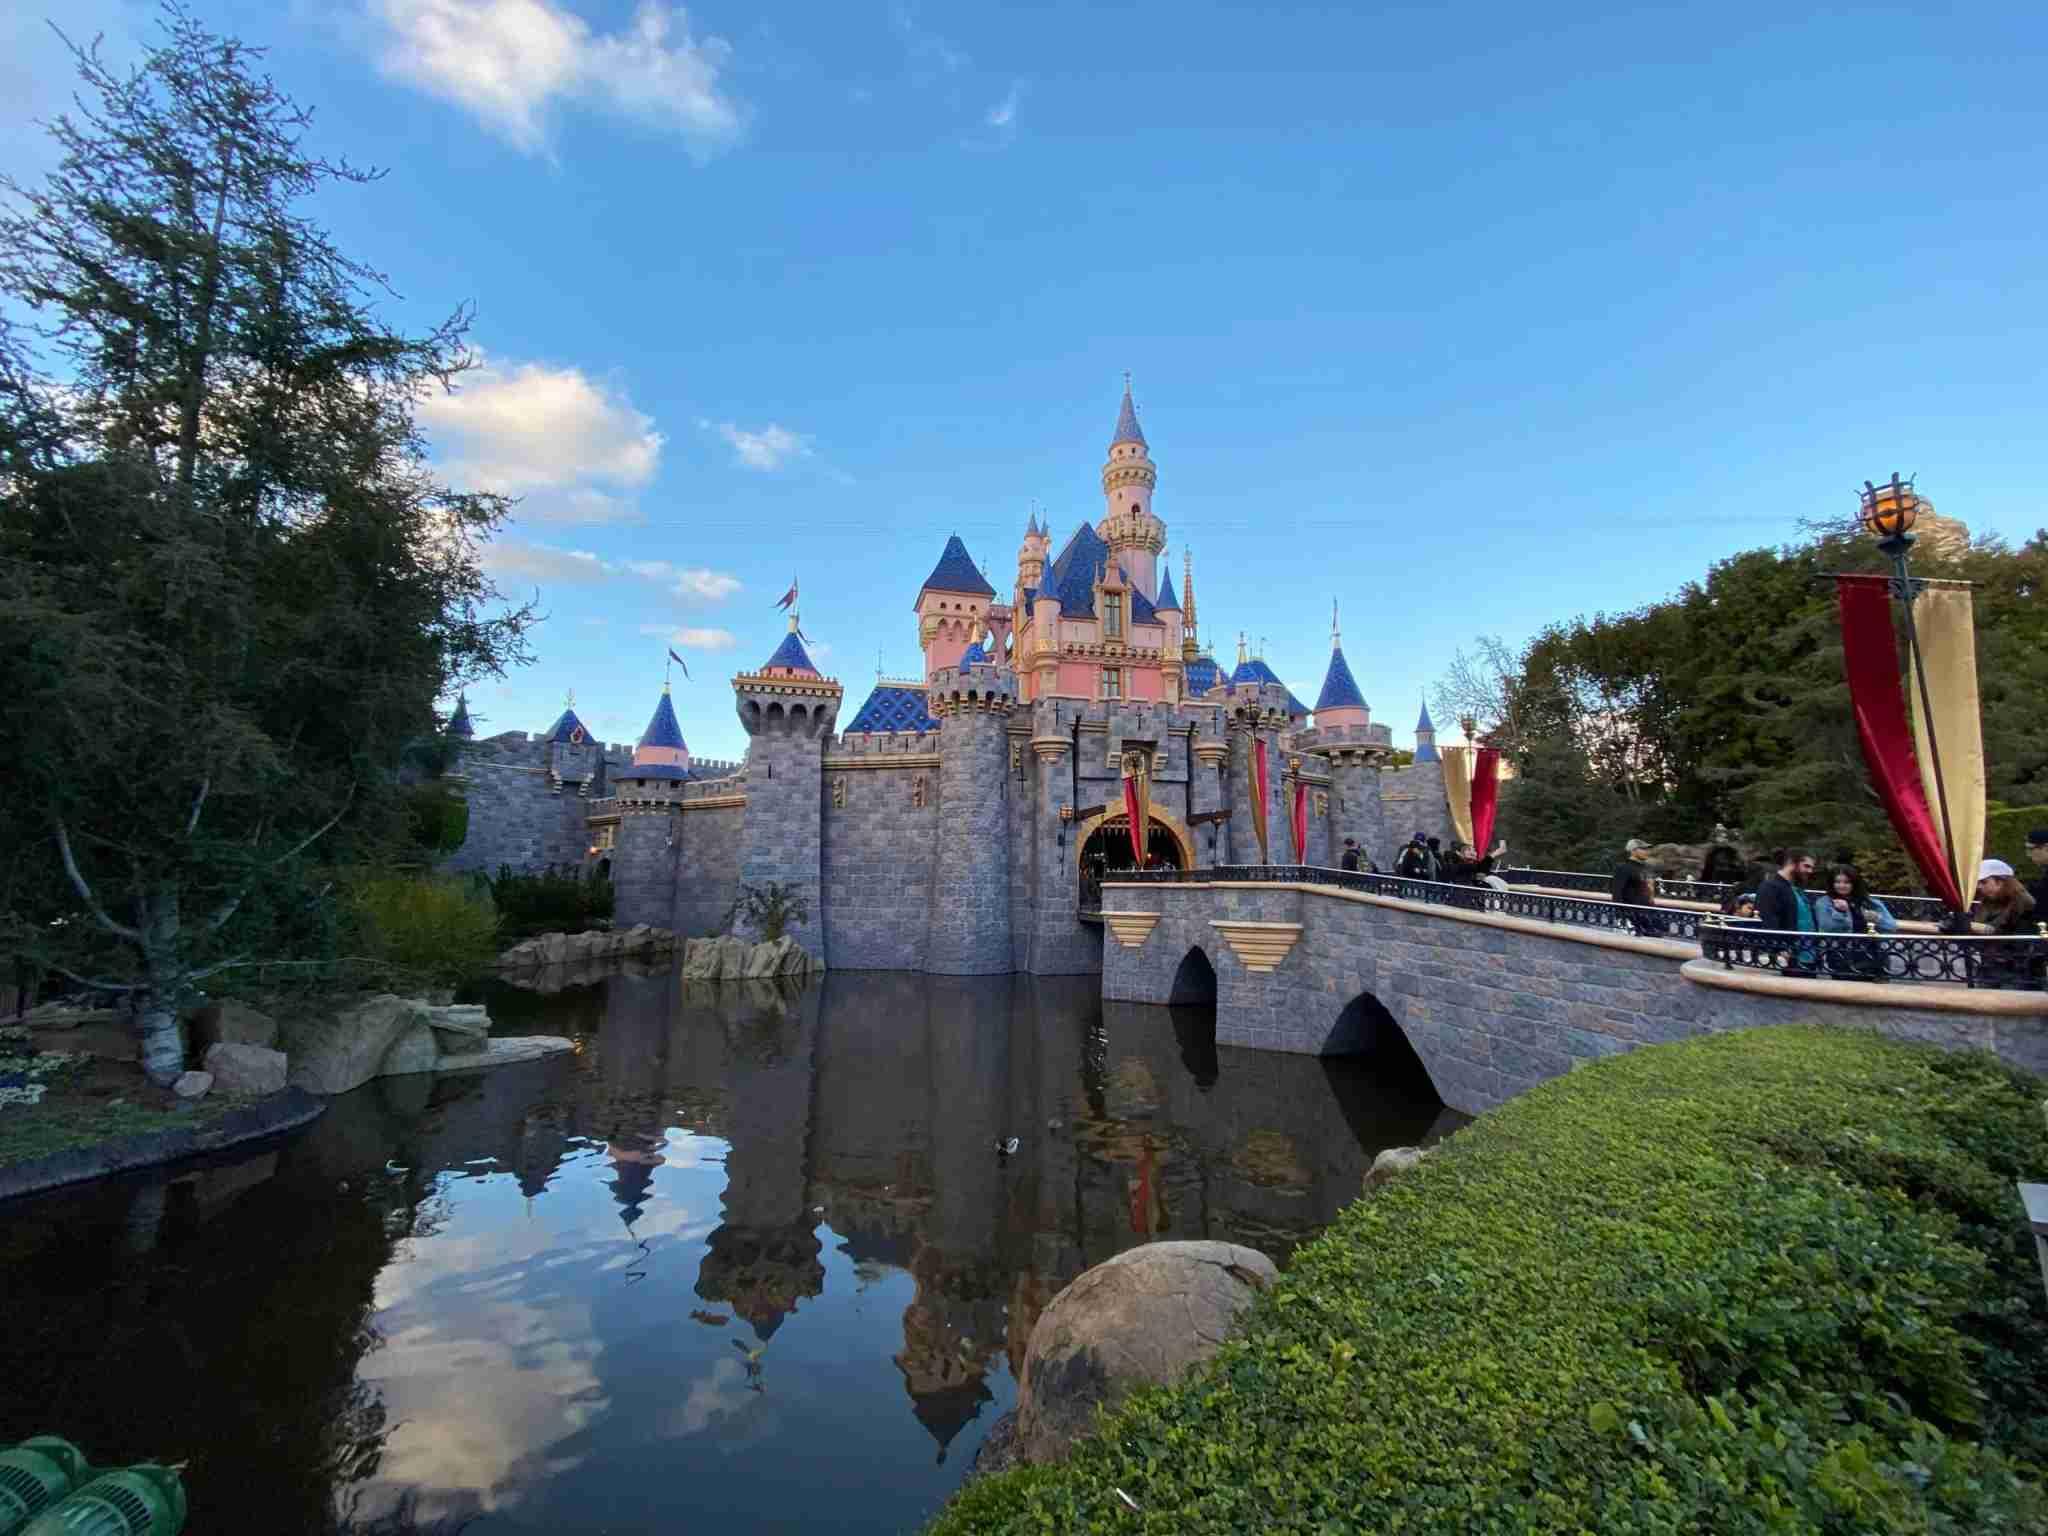 Disneyland Sleeping Beauty Castle 2020 Colors